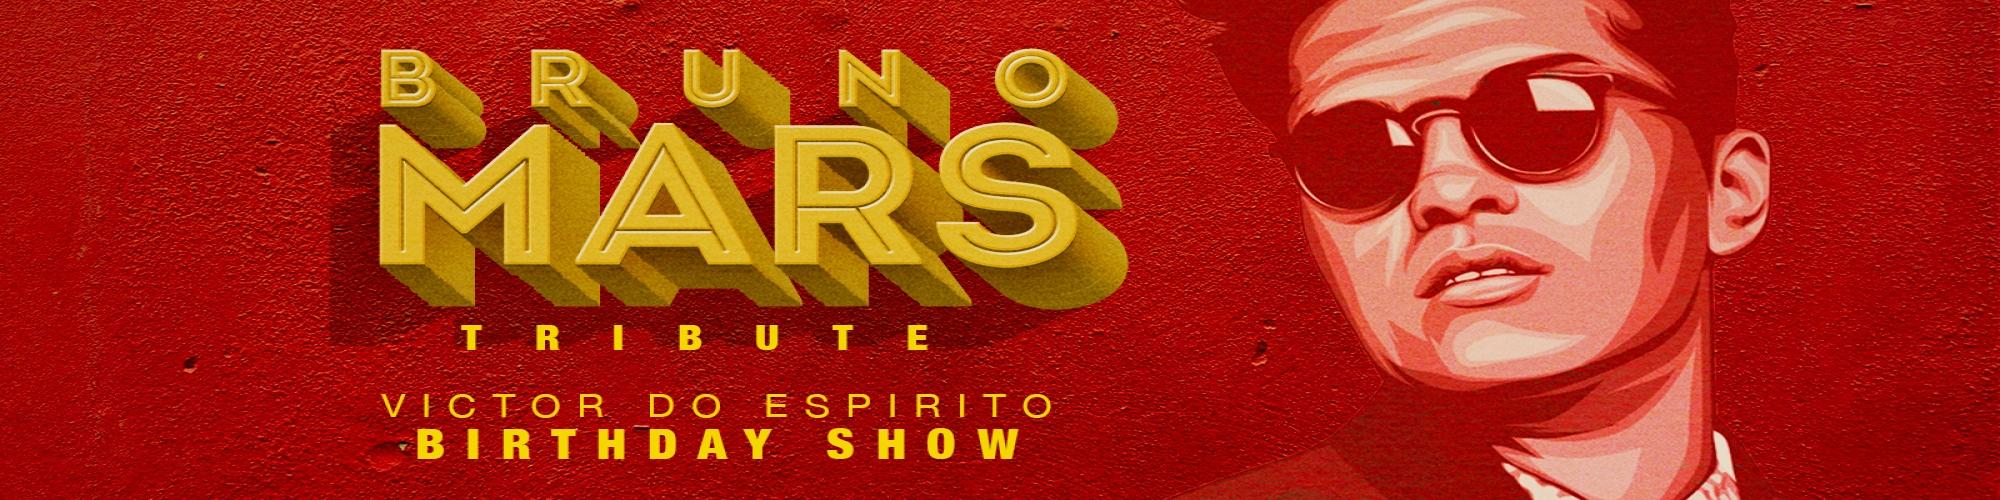 BRUNO MARS - BIRTHDAY SHOW